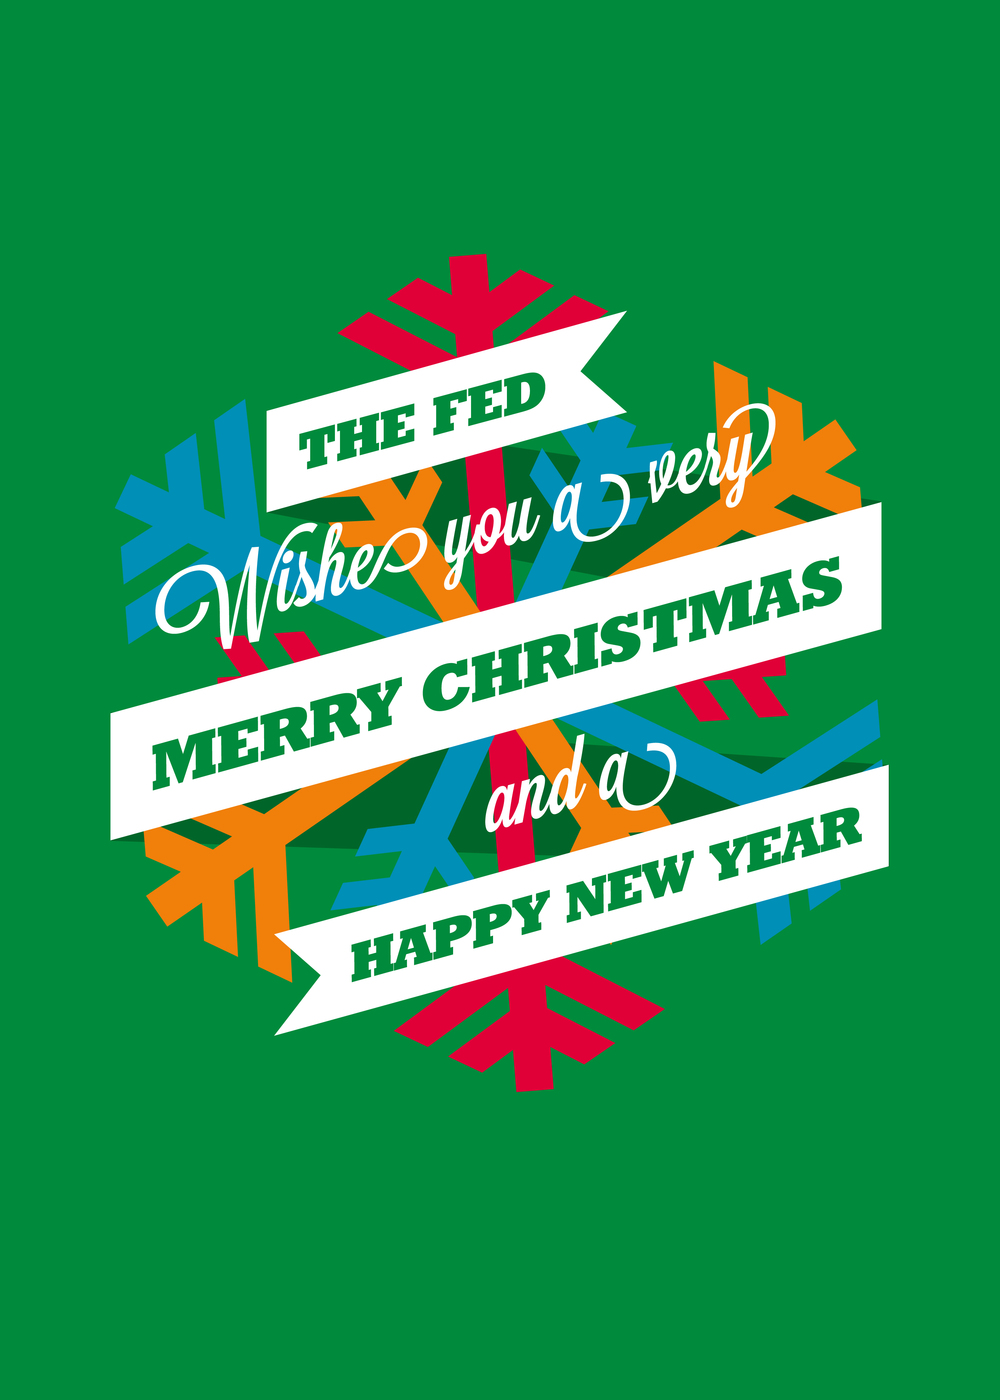 TheFed_ChristmasCard_2013-02.jpg